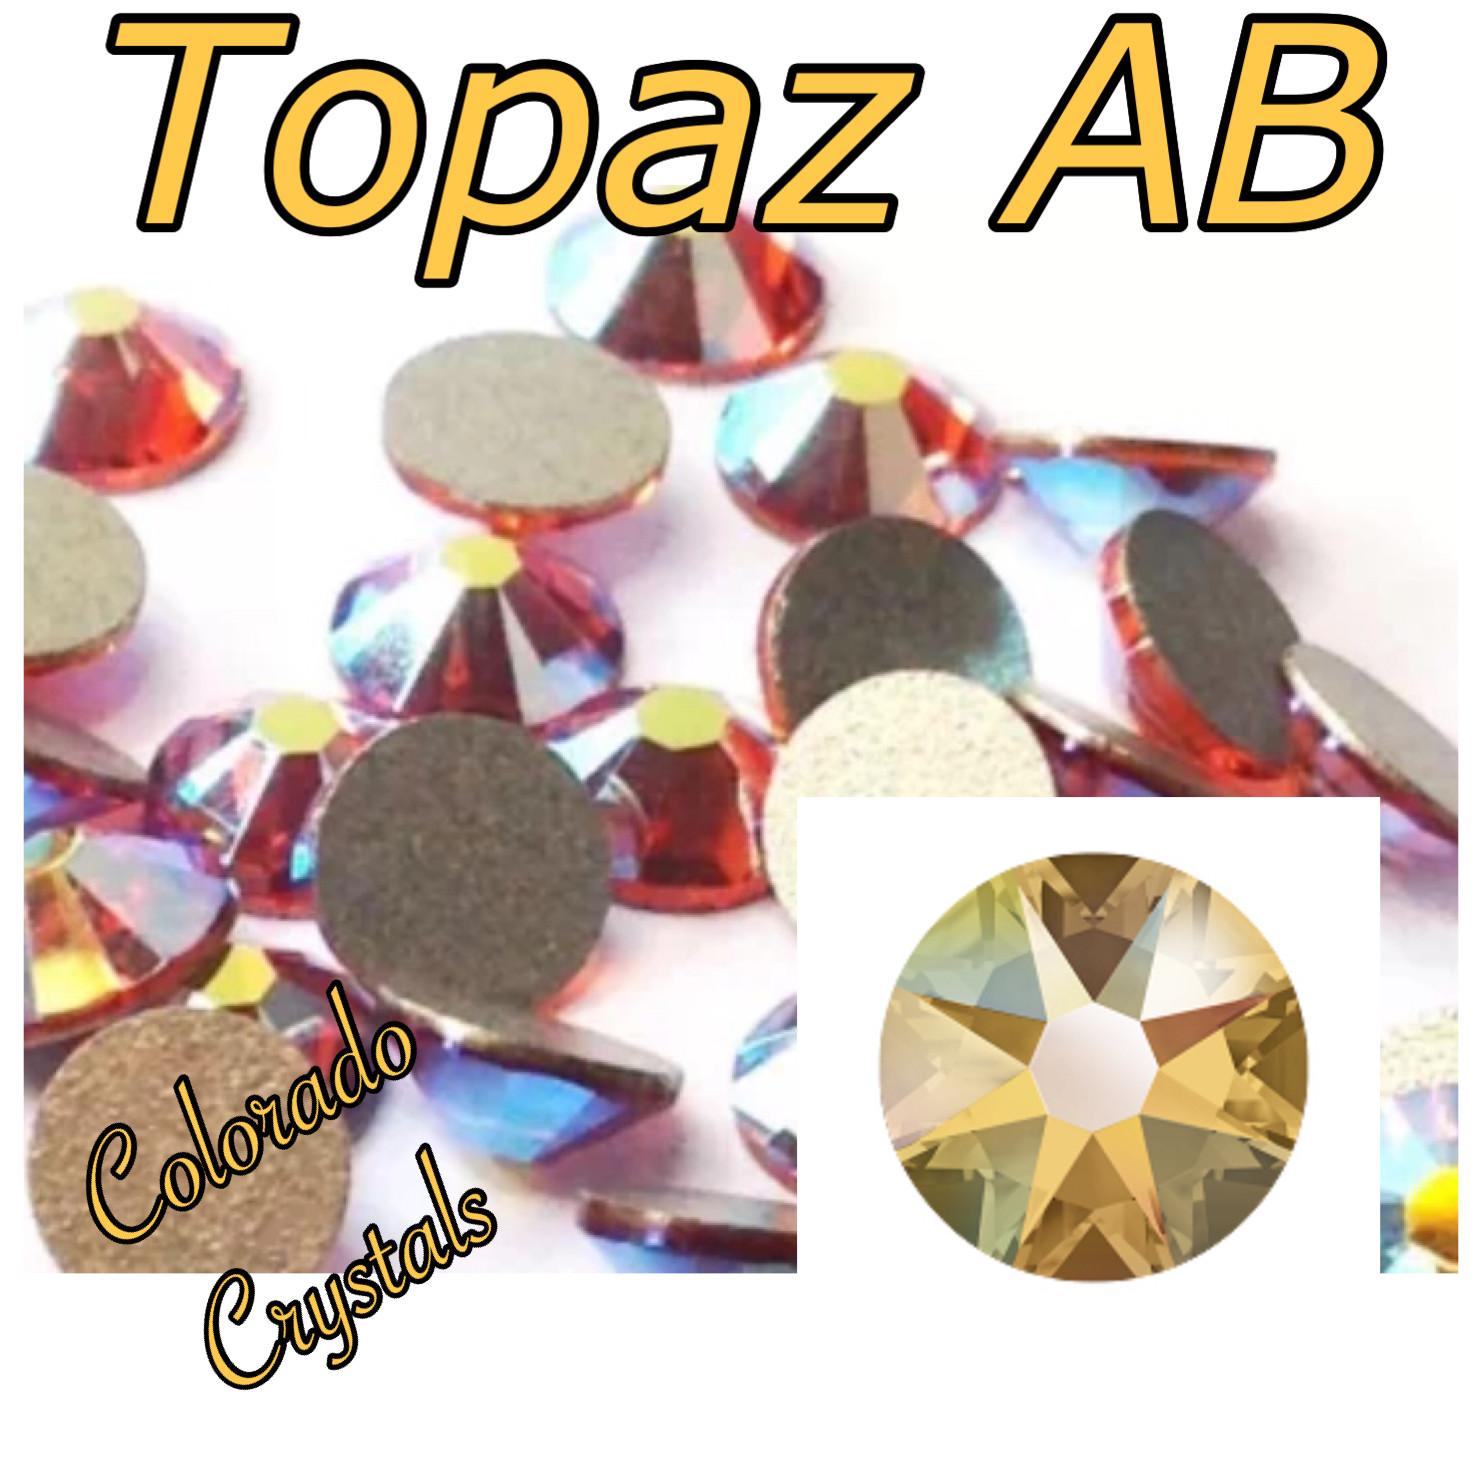 Topaz AB 16ss 2088